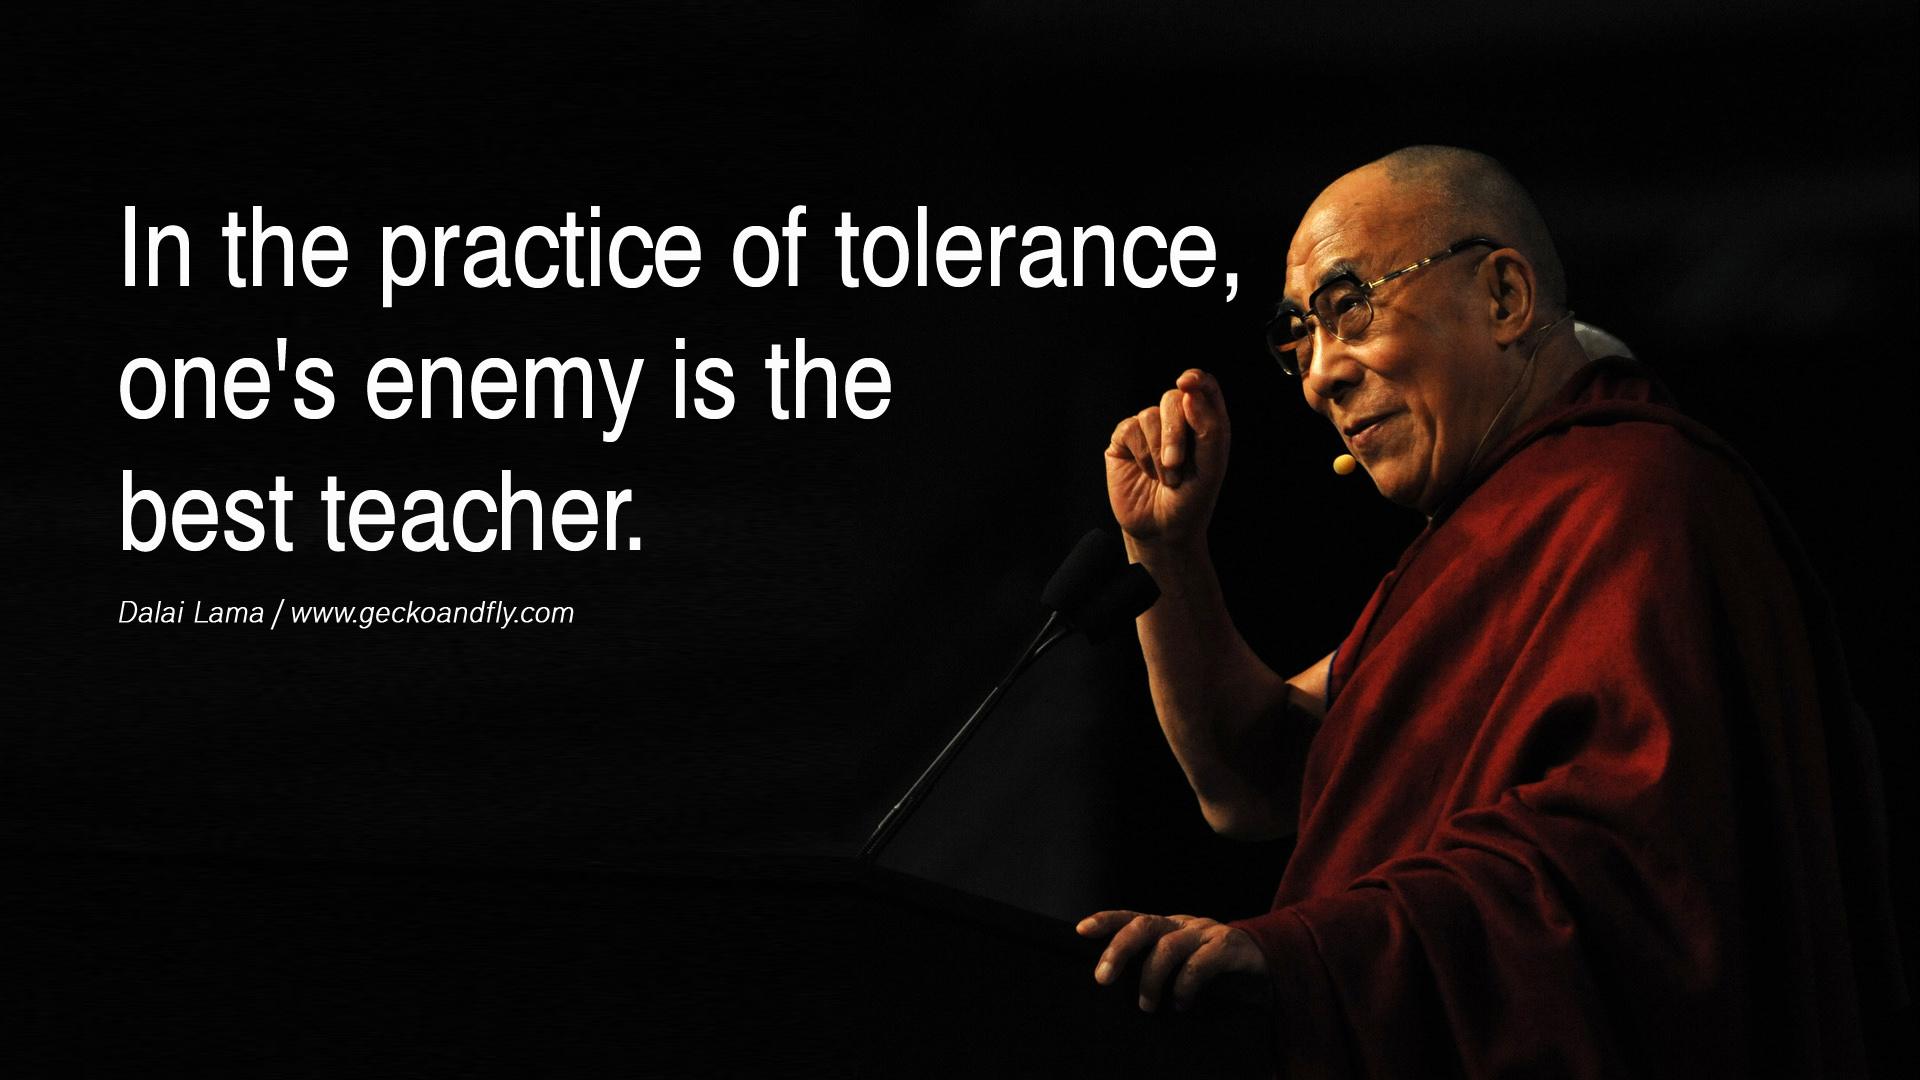 dalai lama quotes on life - photo #36